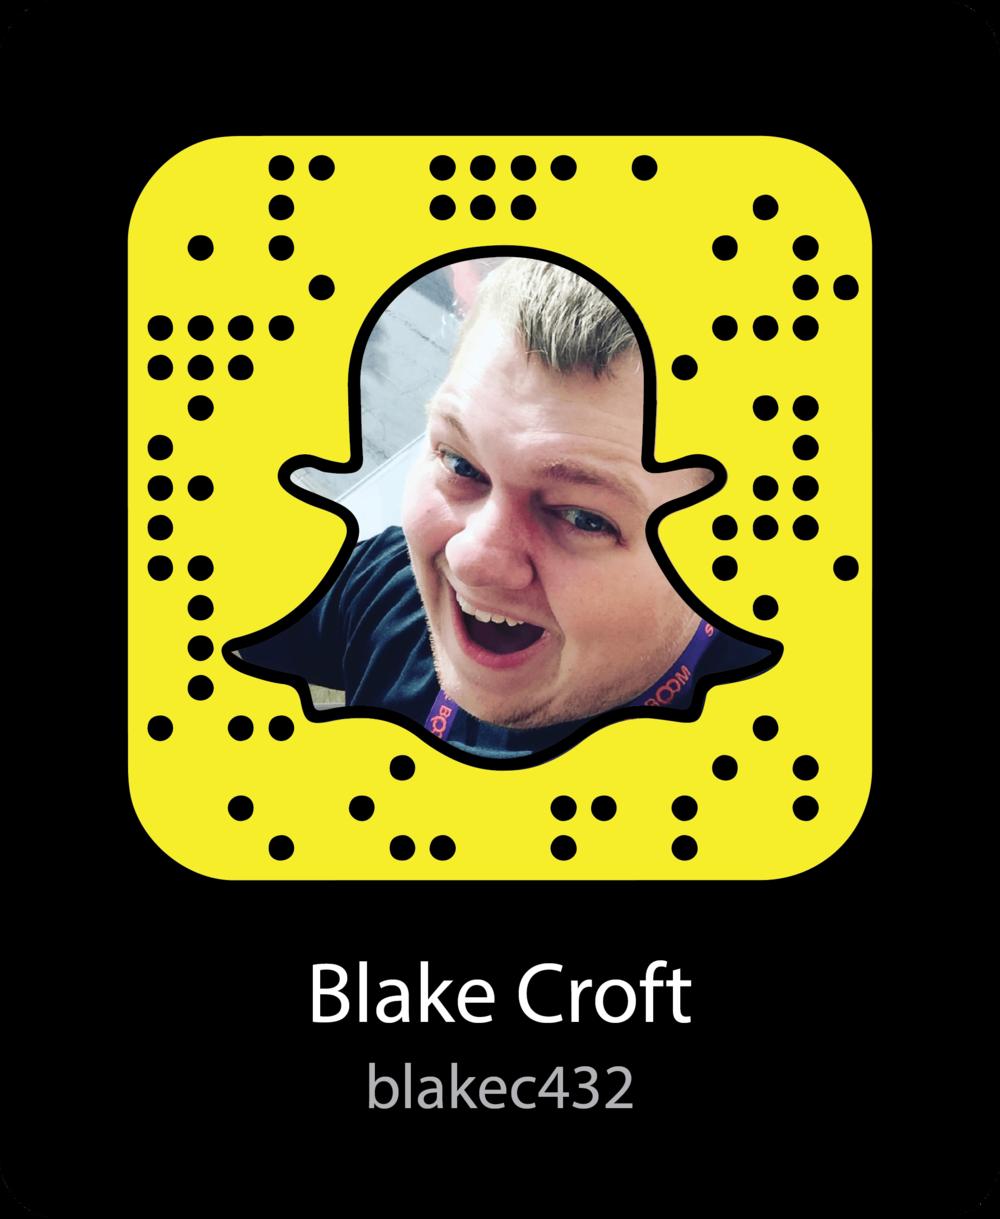 blake-croft-storytellers-snapchat-snapcode.png